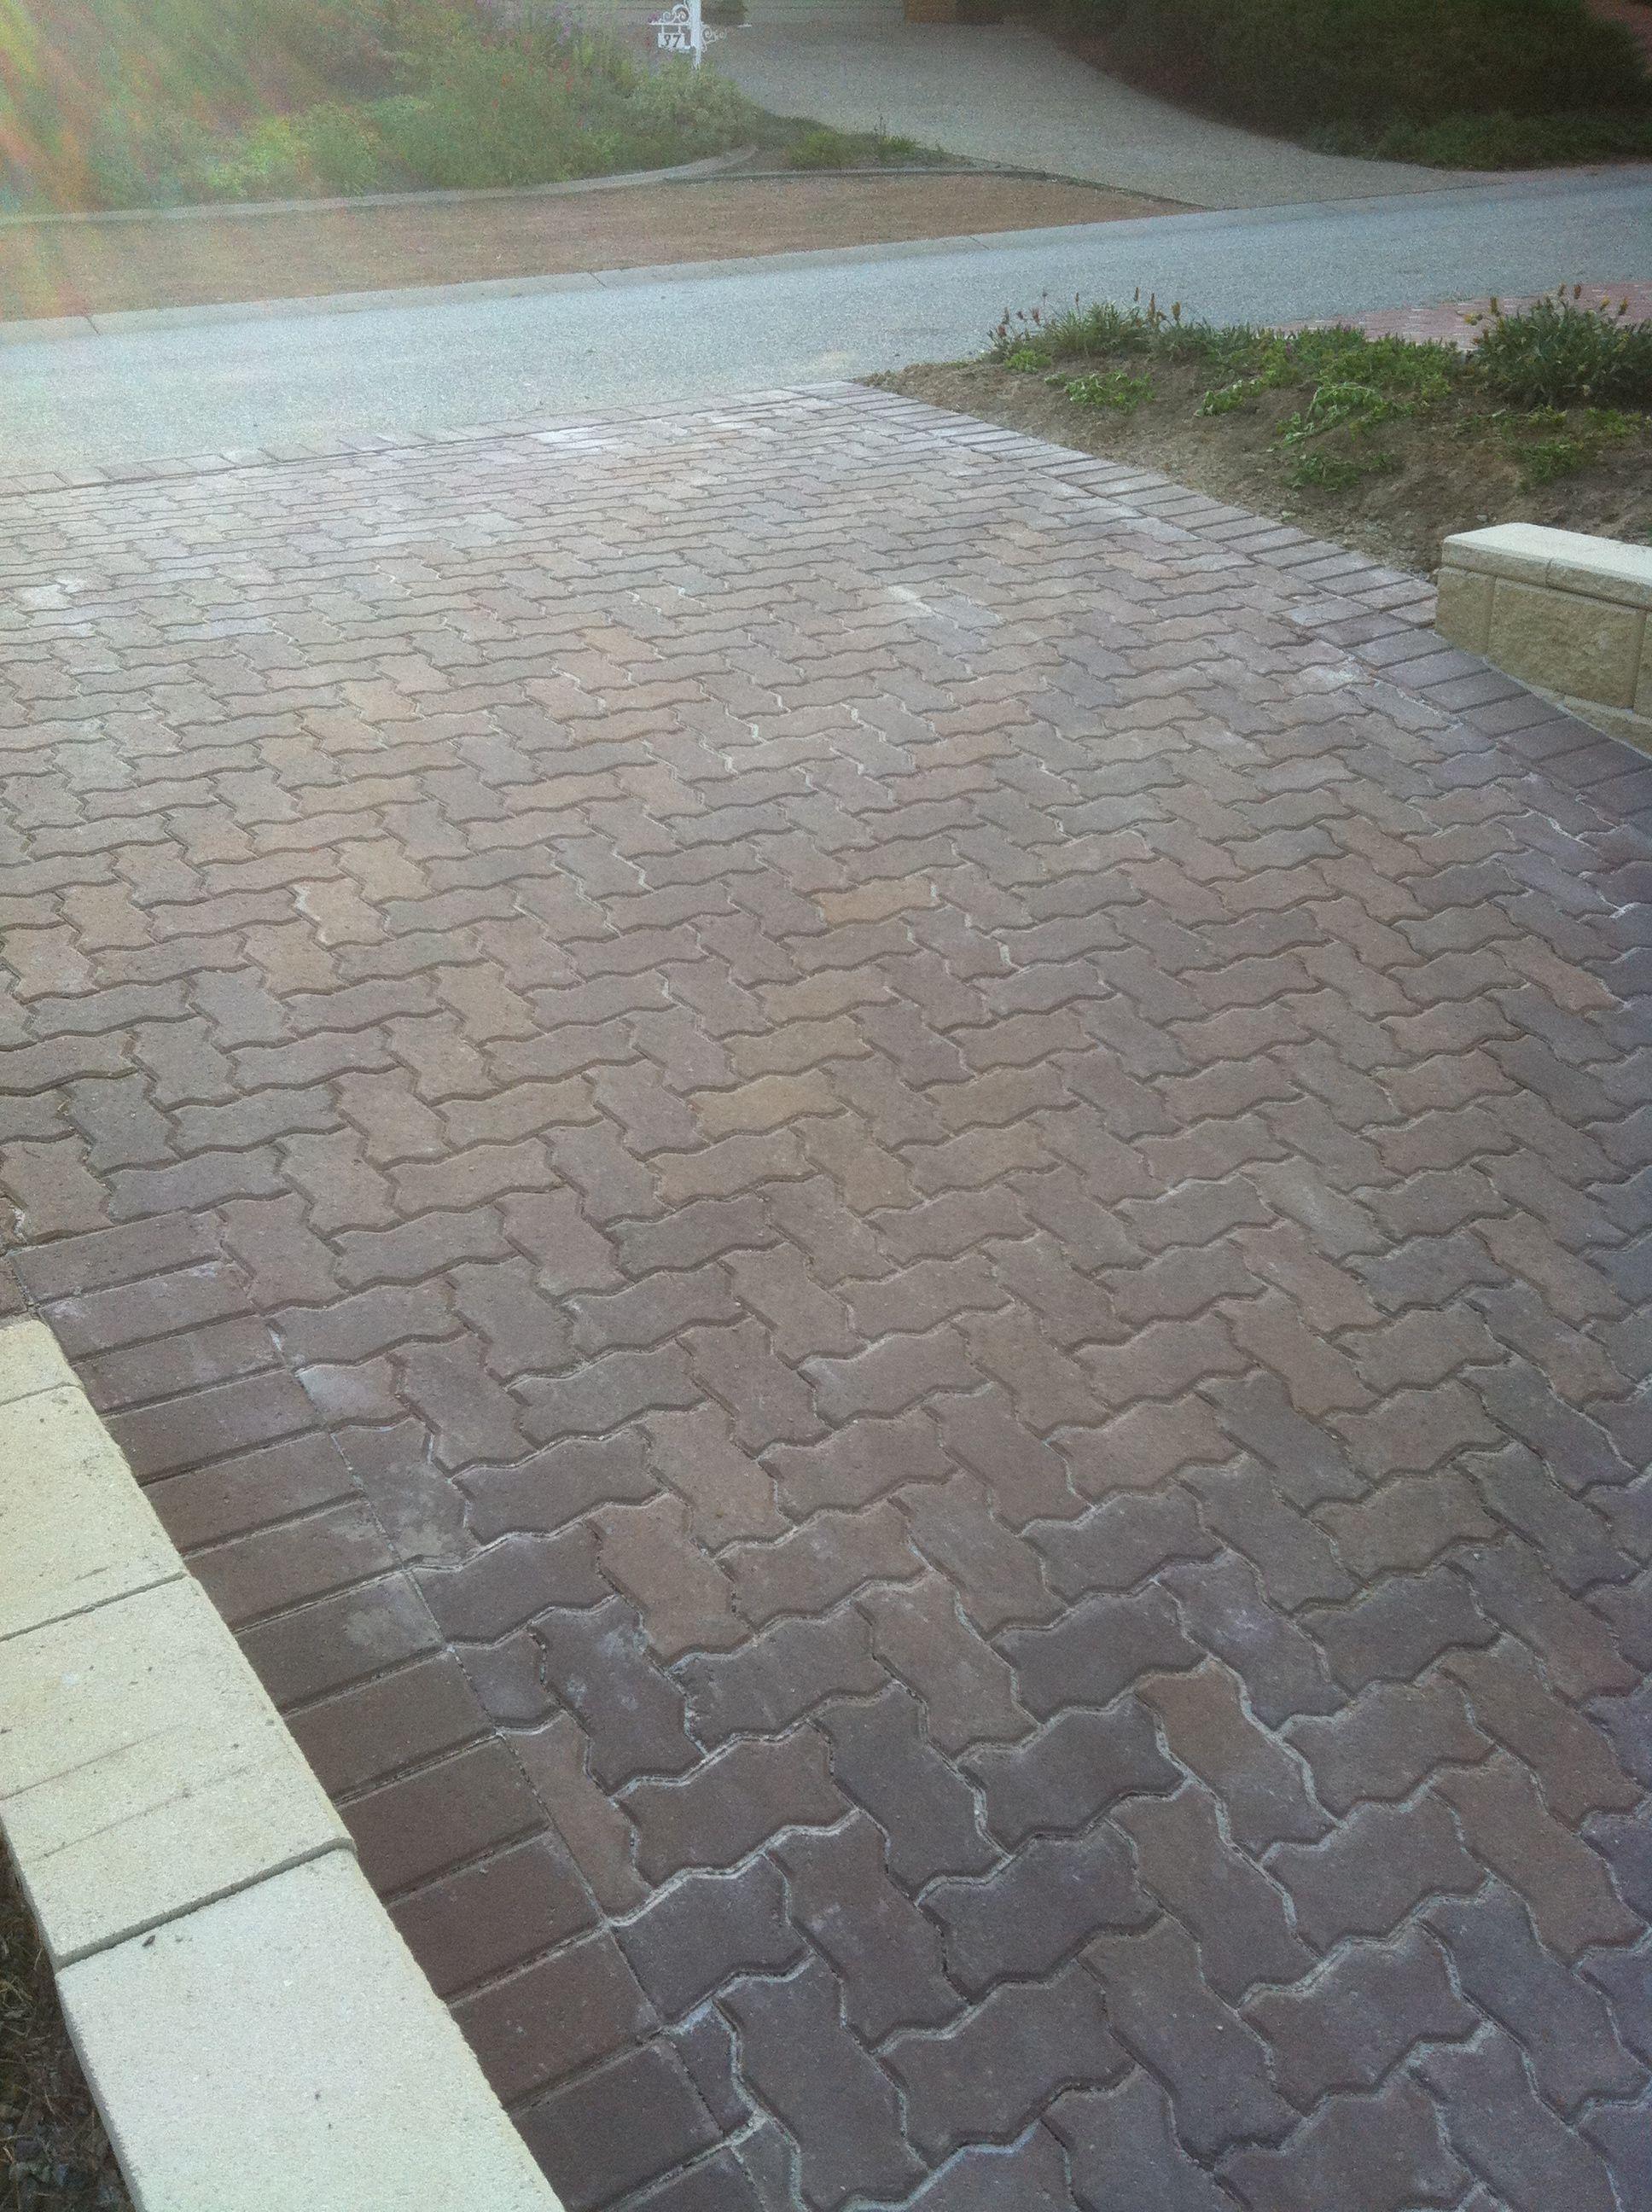 Driveway paving Adbri pavers 230mm x 115mm